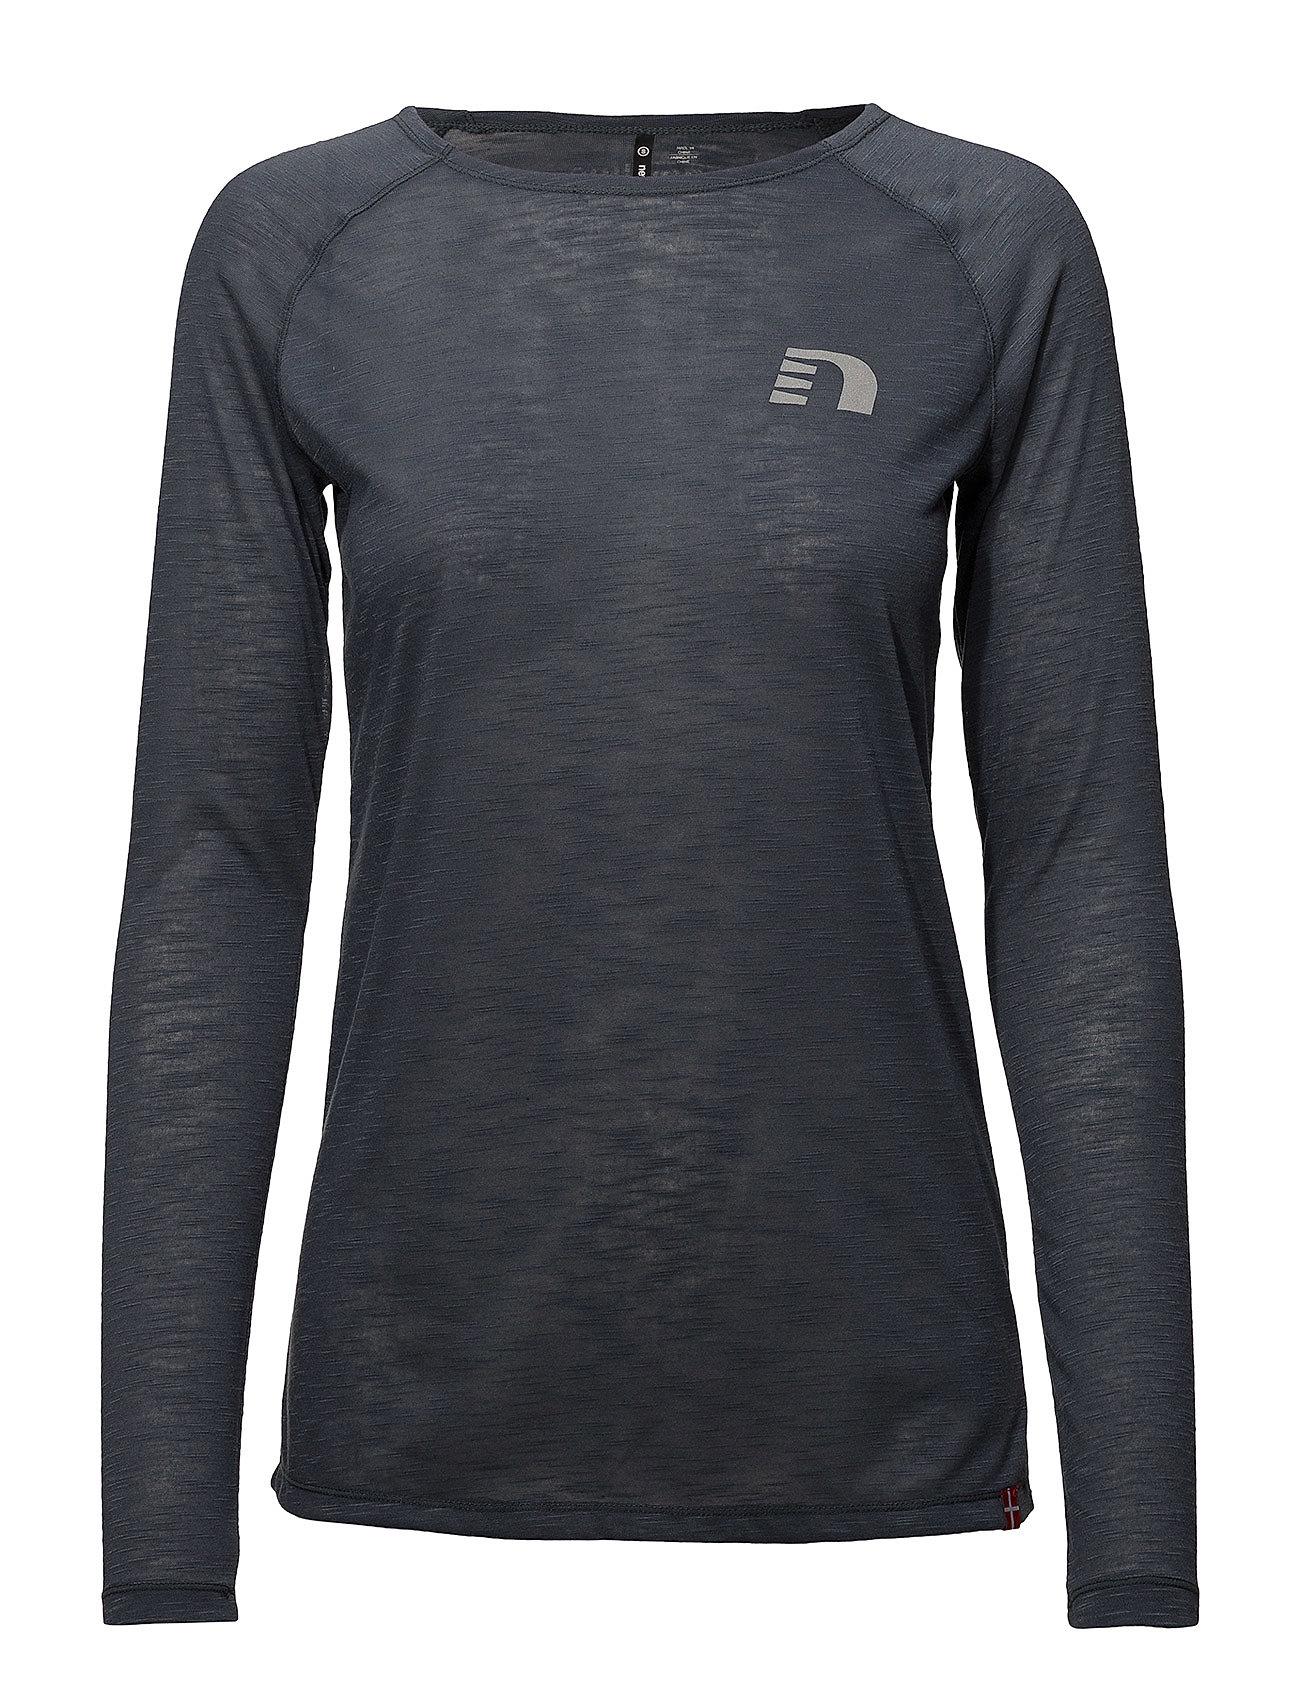 Newline Imotion Shirt